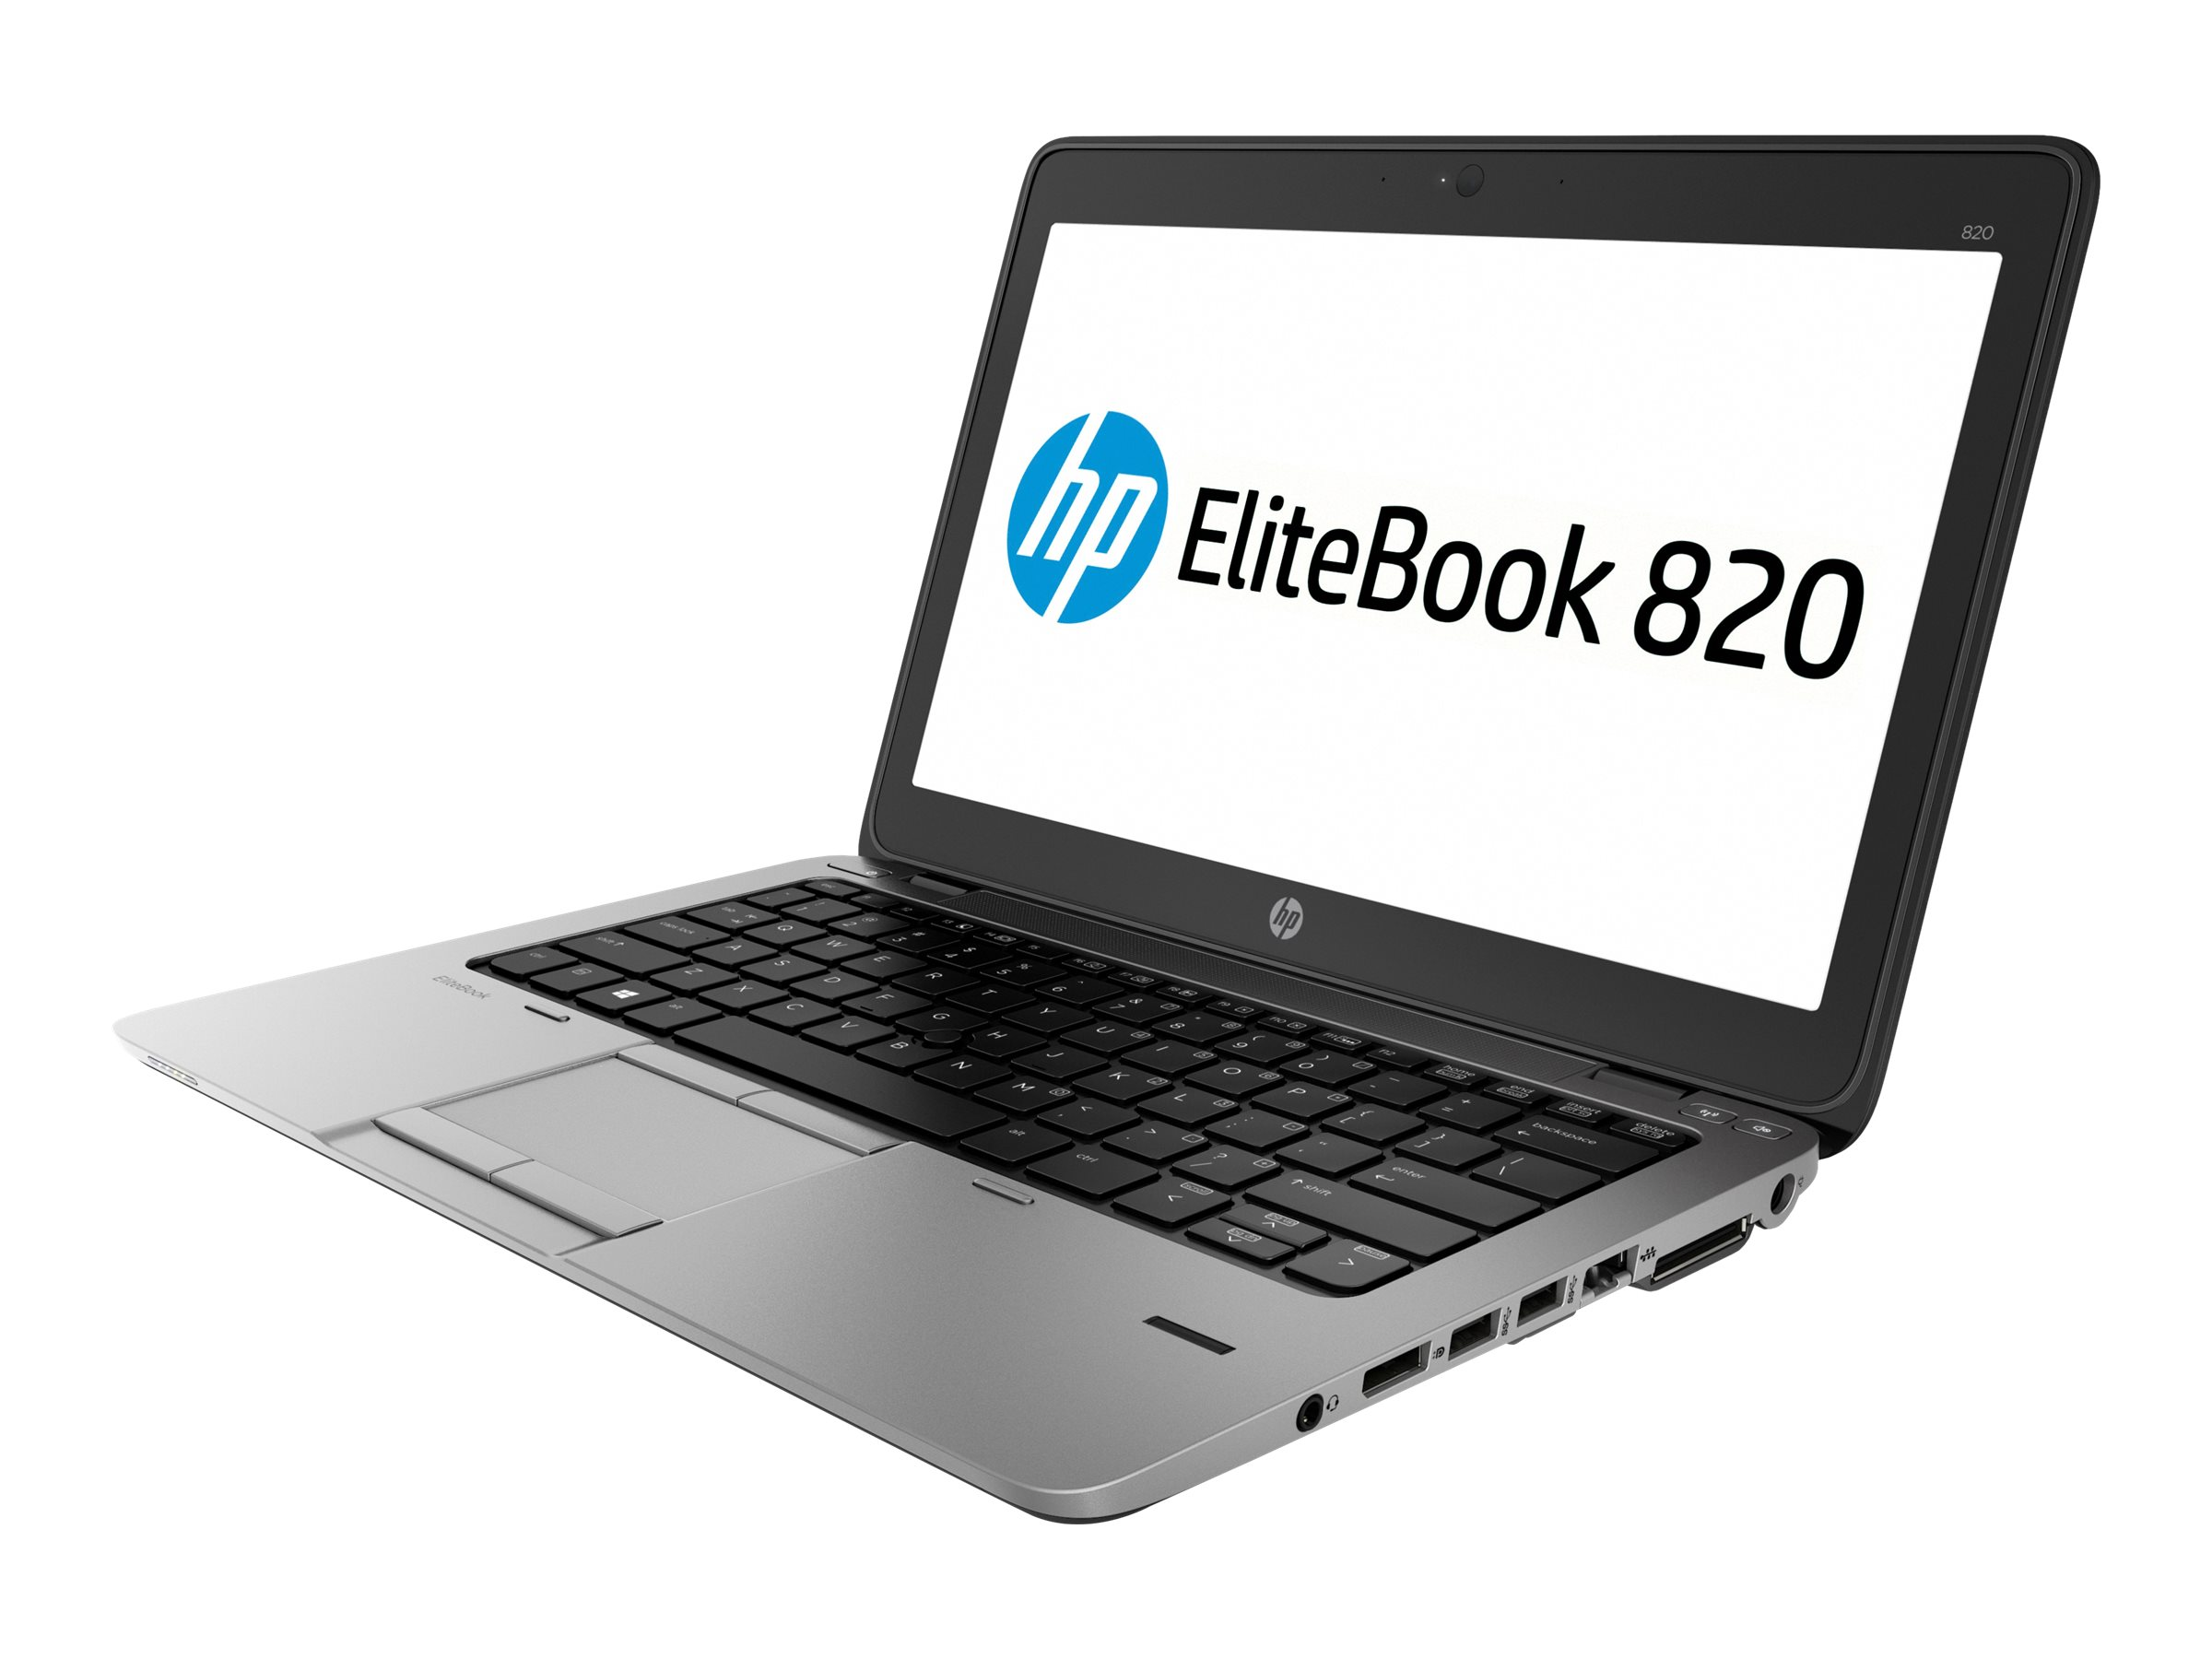 HP EliteBook 820 G1 - PC portable 12.5